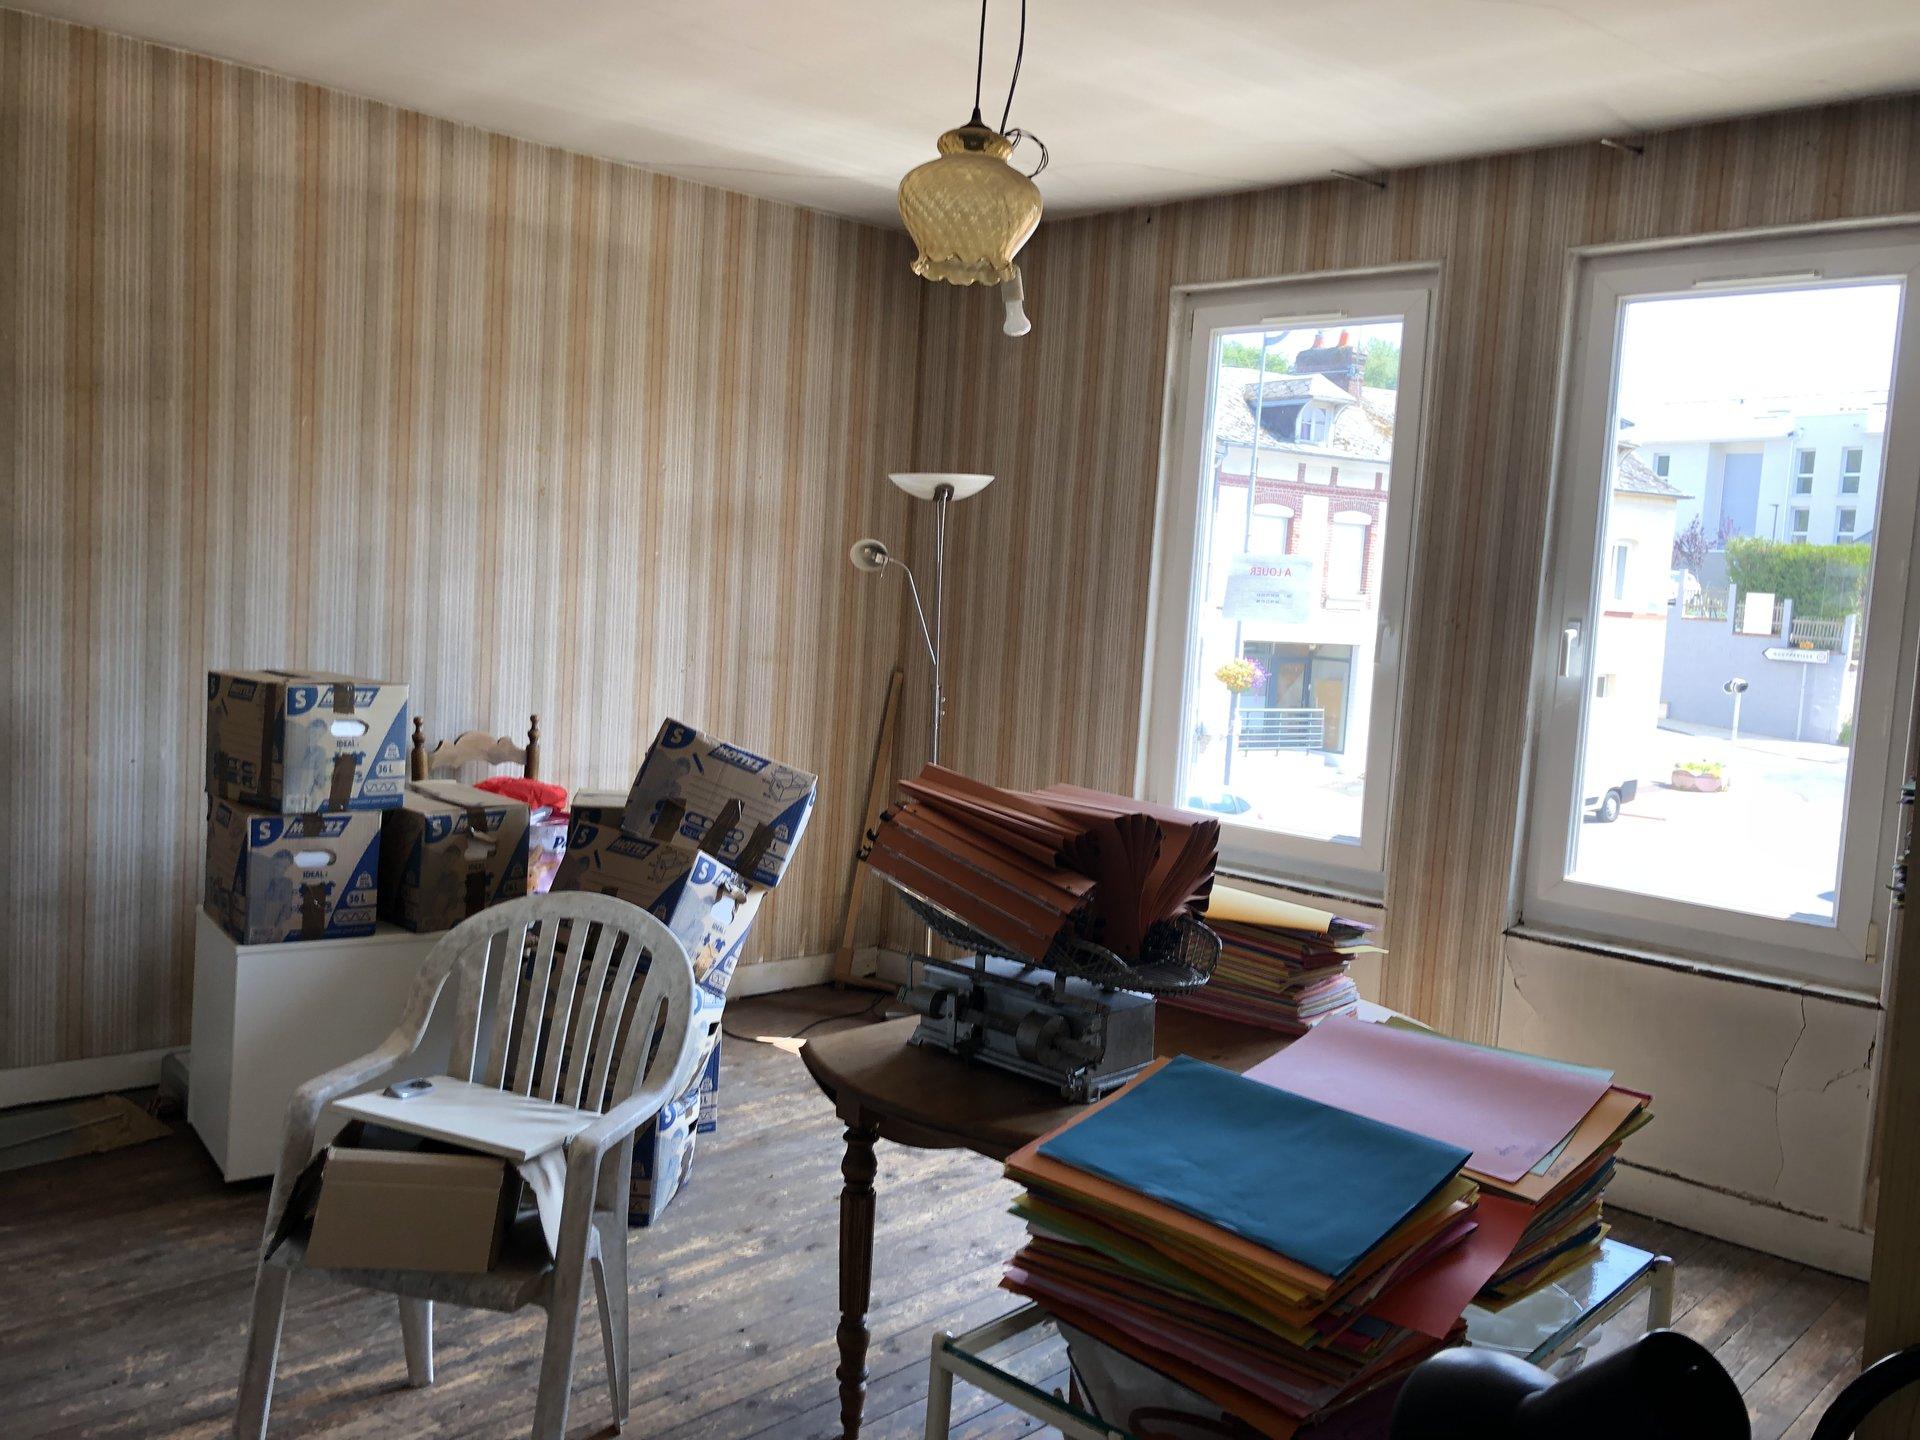 Rental Office - Le Houlme